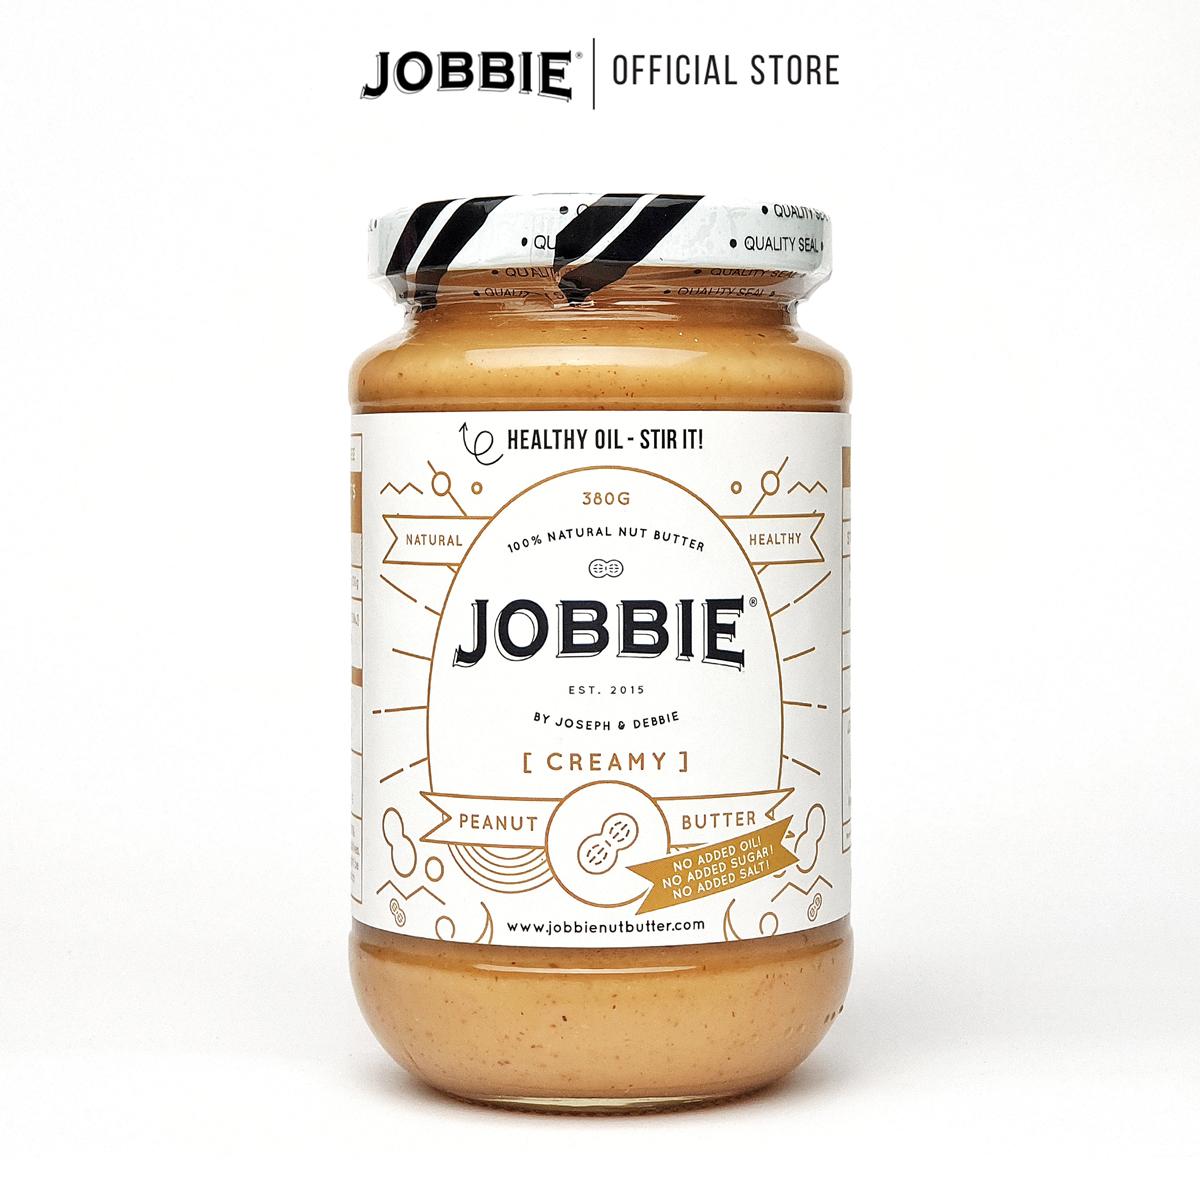 JOBBIE Peanut Butter - Creamy Pure (380g) - No Sugar & Salt